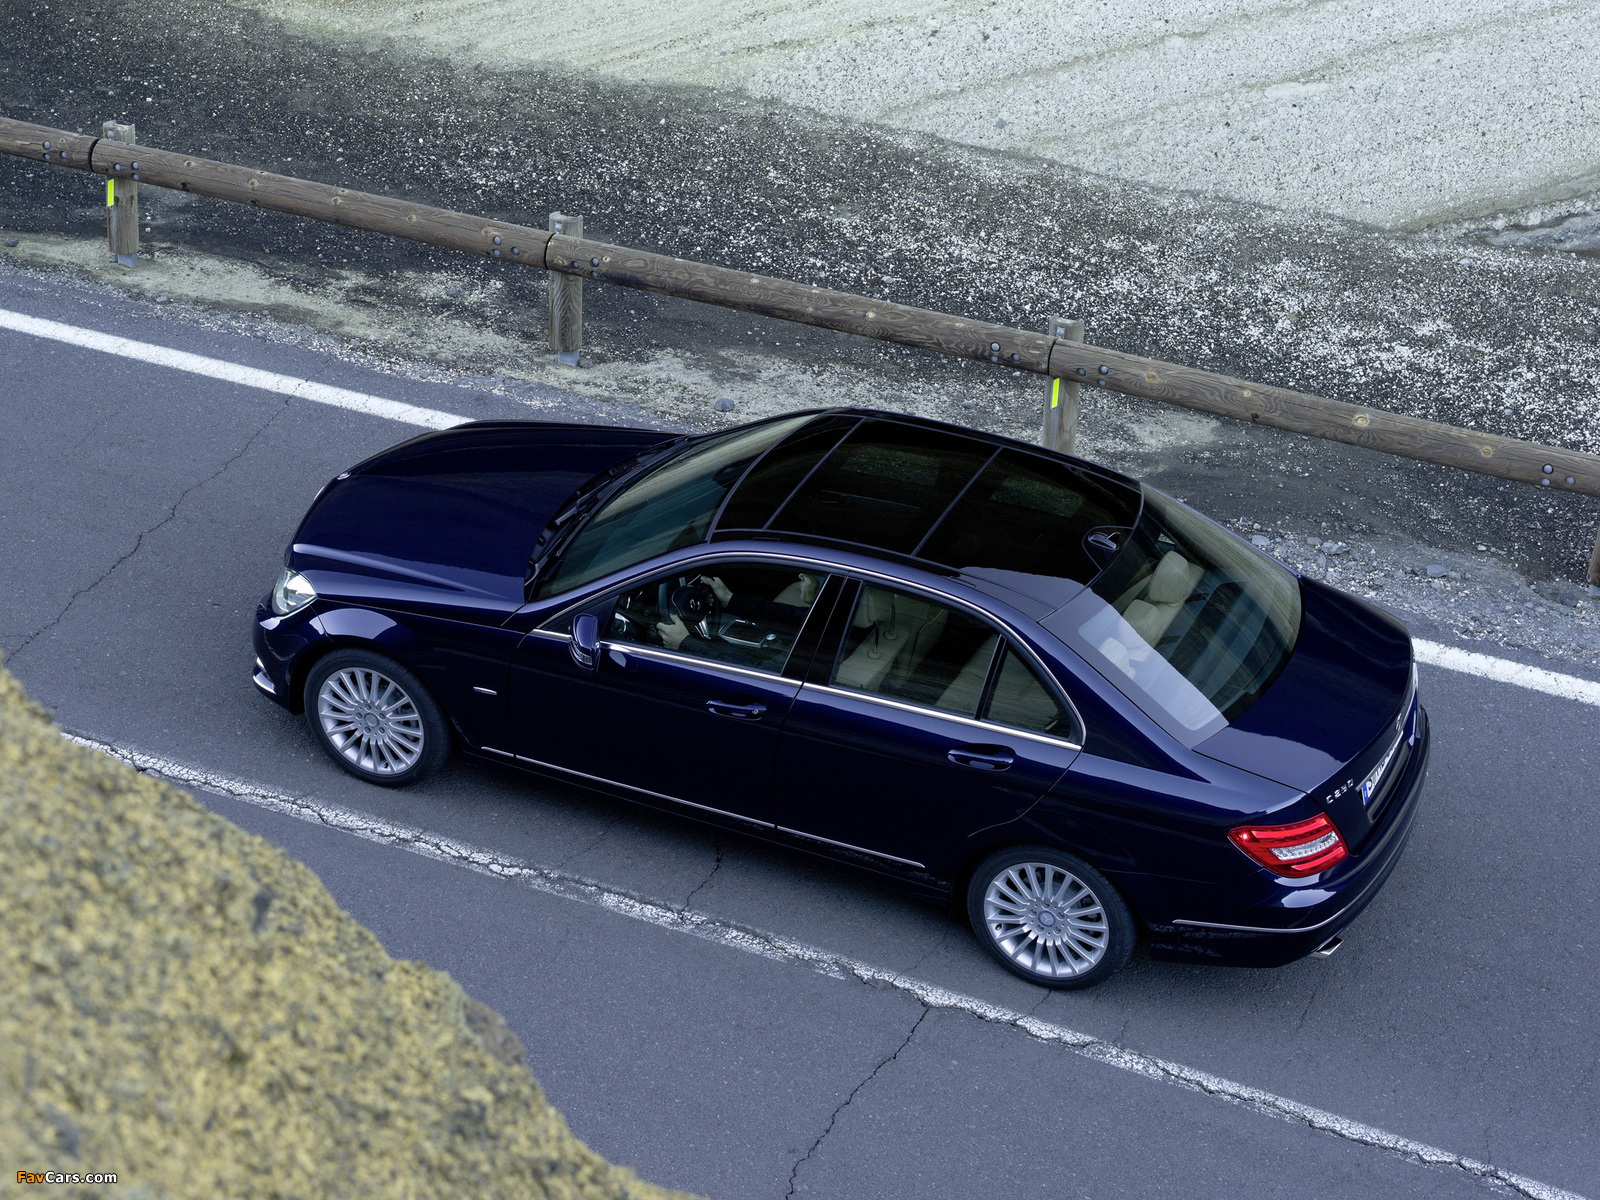 Mercedes-Benz C 250 CDI BlueEfficiency (W204) 2011 photos (1600 x 1200)